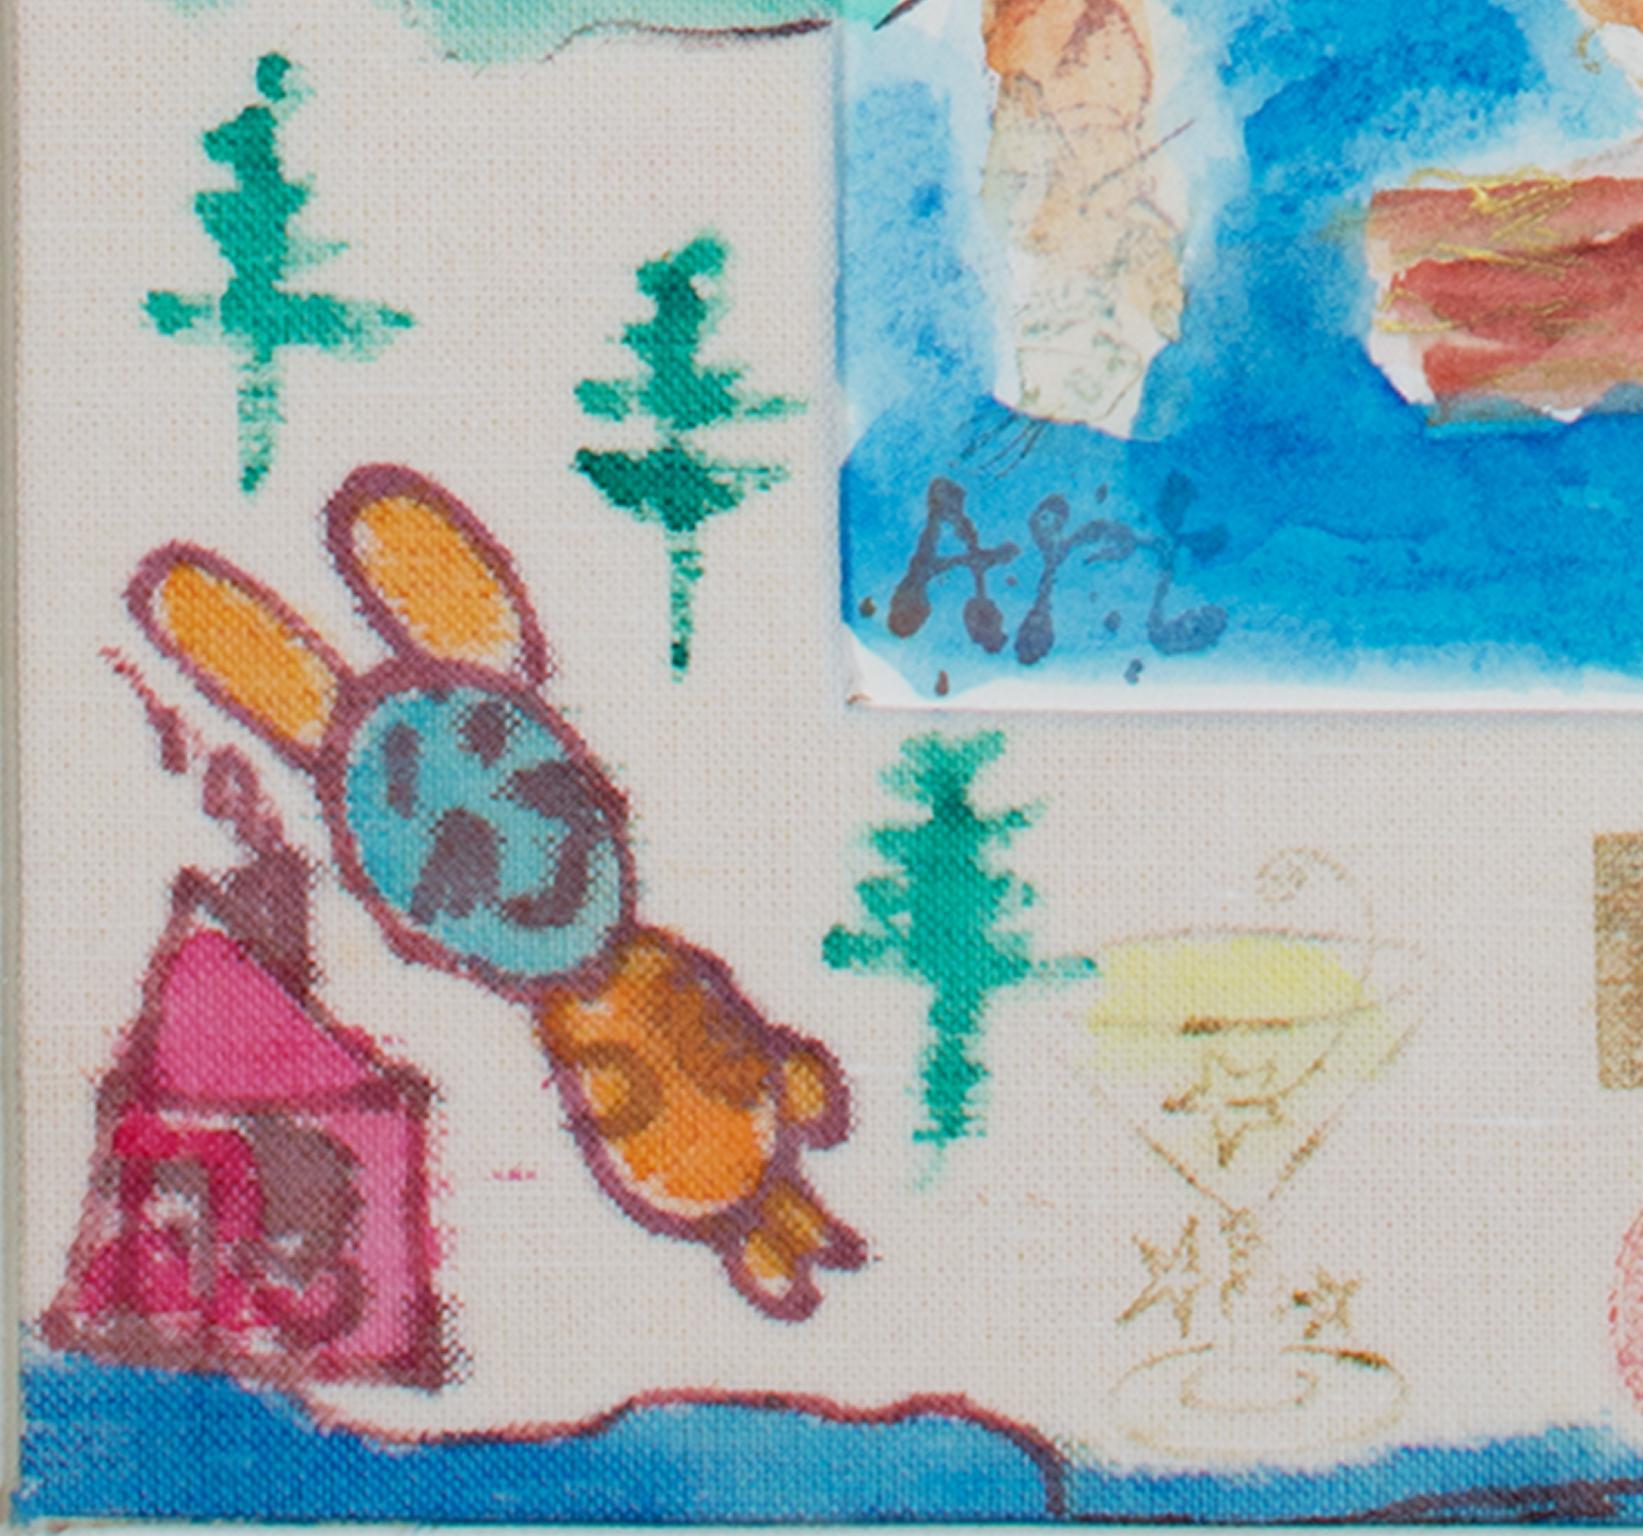 """Up North Series: Dreaming of Minoqua and Eagle River,"" by David & Sarah Barnett"